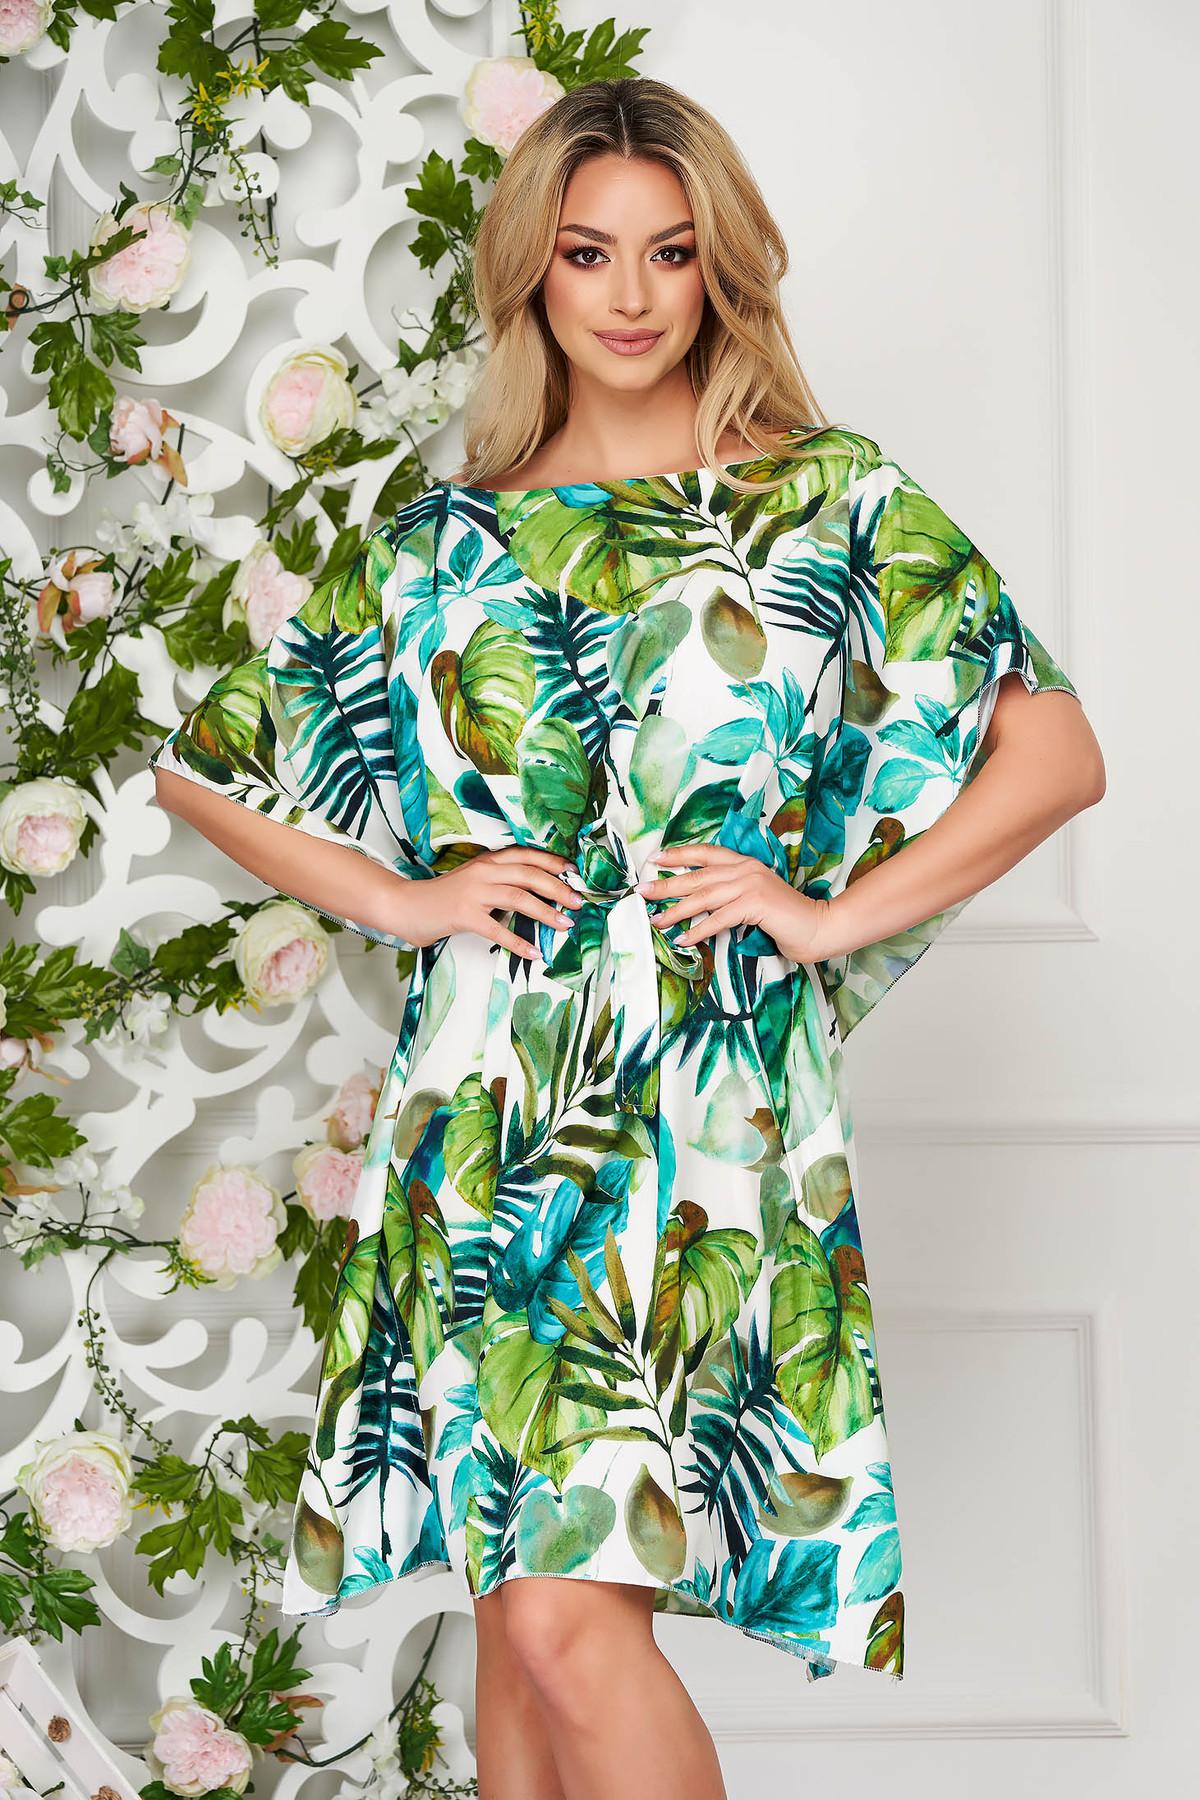 Rochie SunShine verde scurta cu croi larg din material subtire cu maneci tip fluture